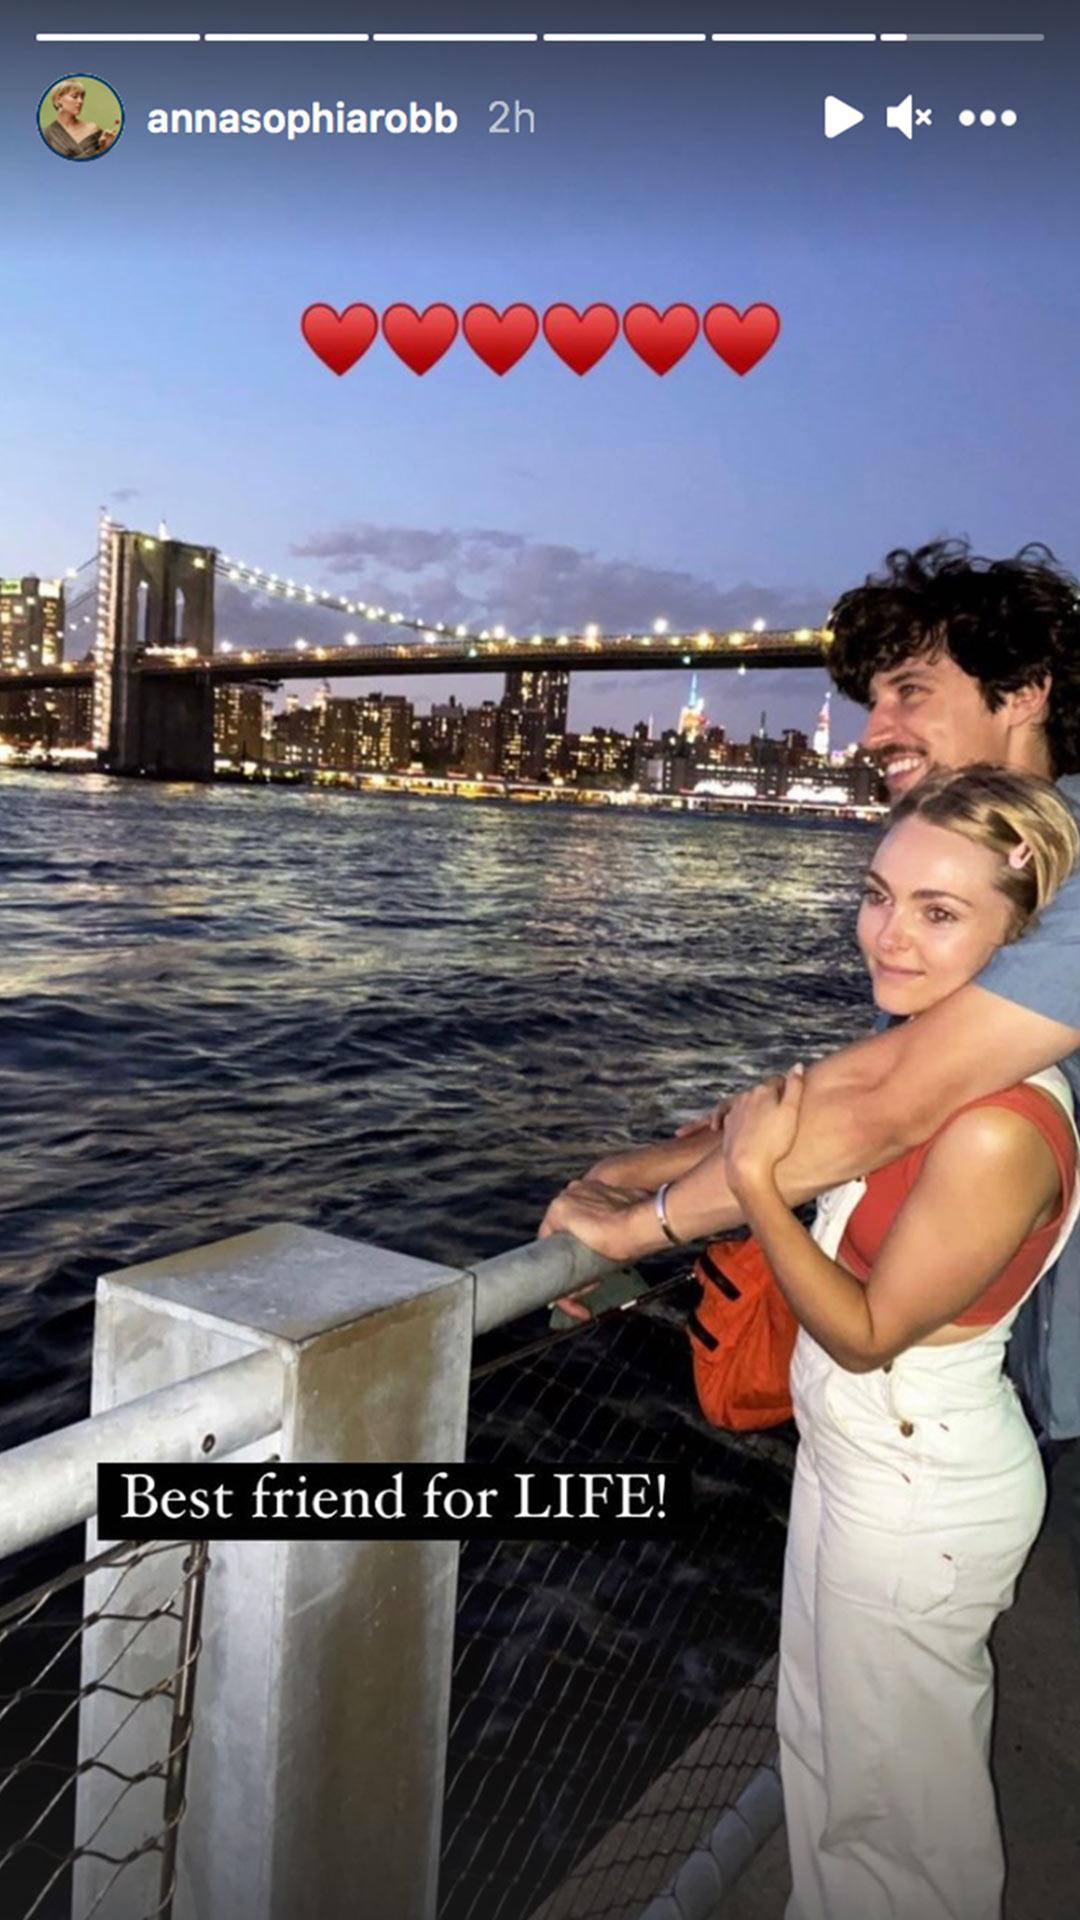 AnnaSophia Robb engaged